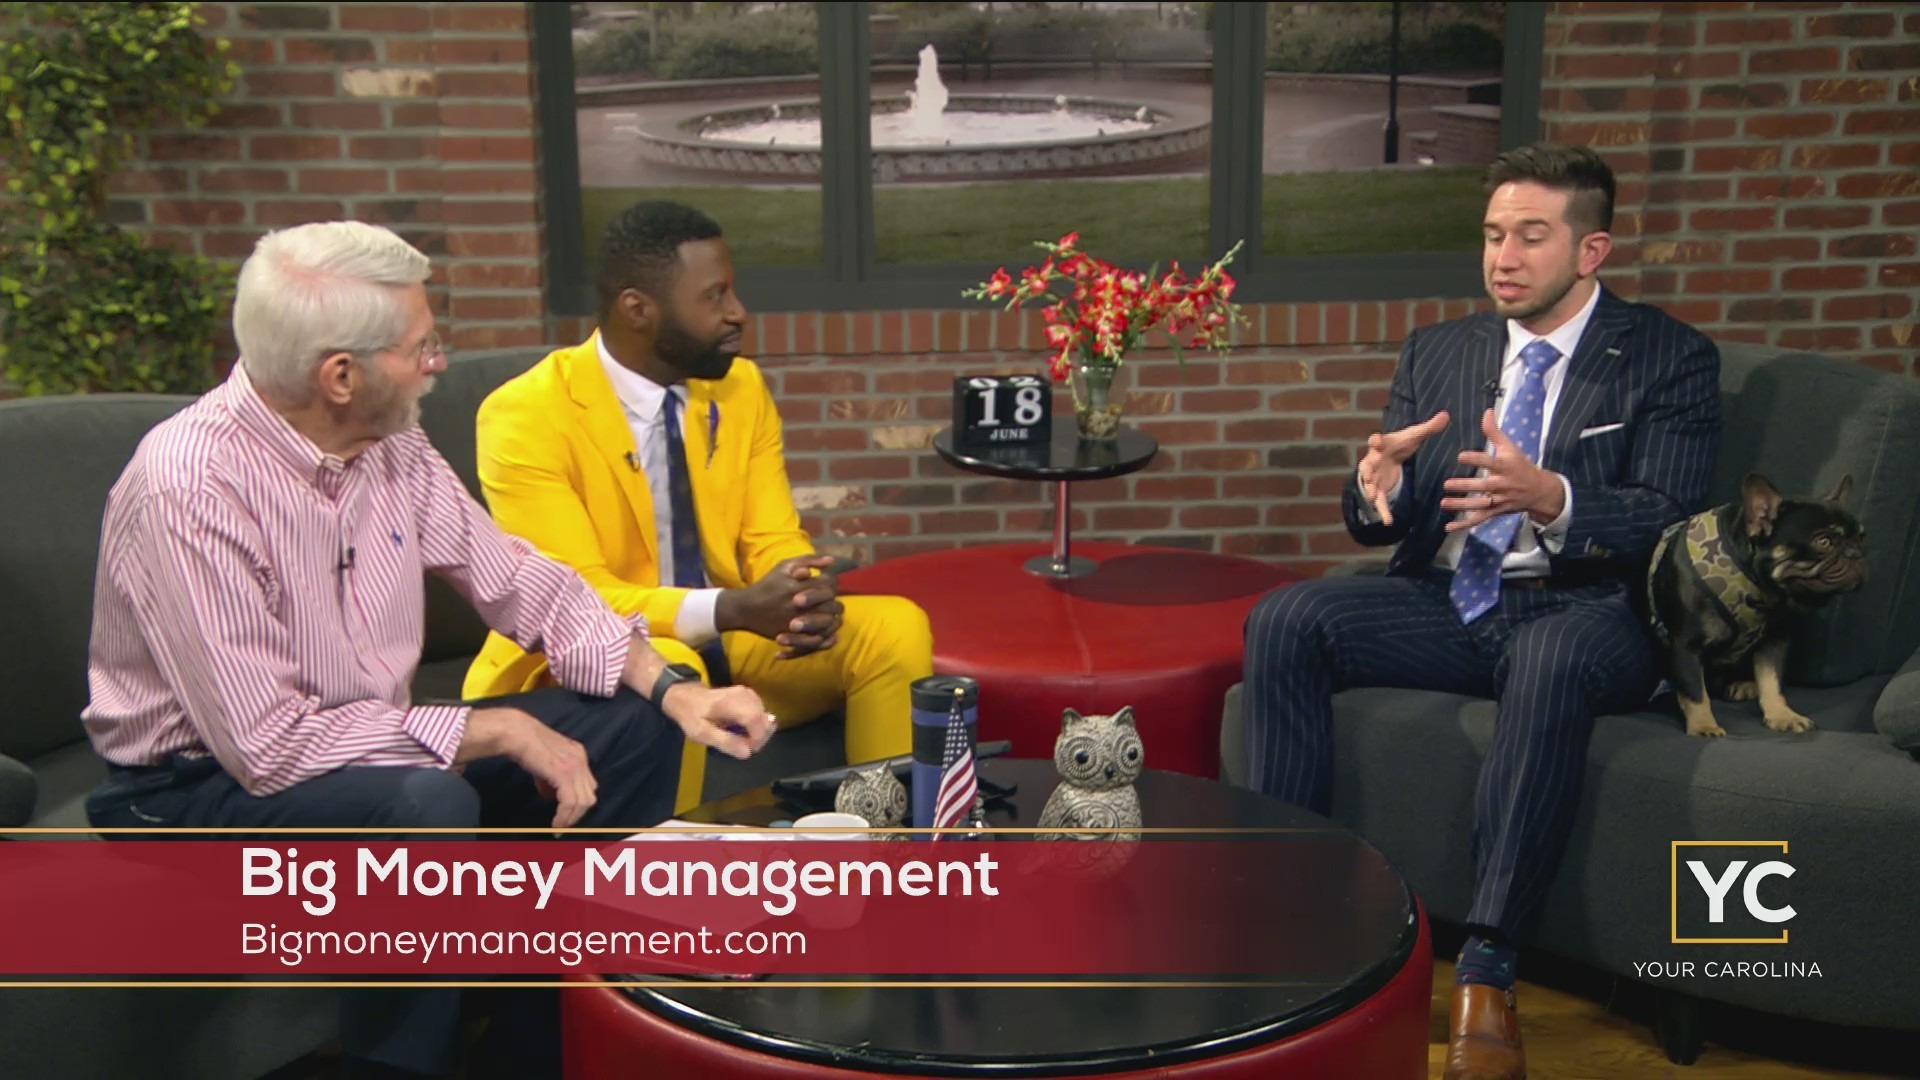 Big Money Management - Is Your Retirement Portfolio At Risk